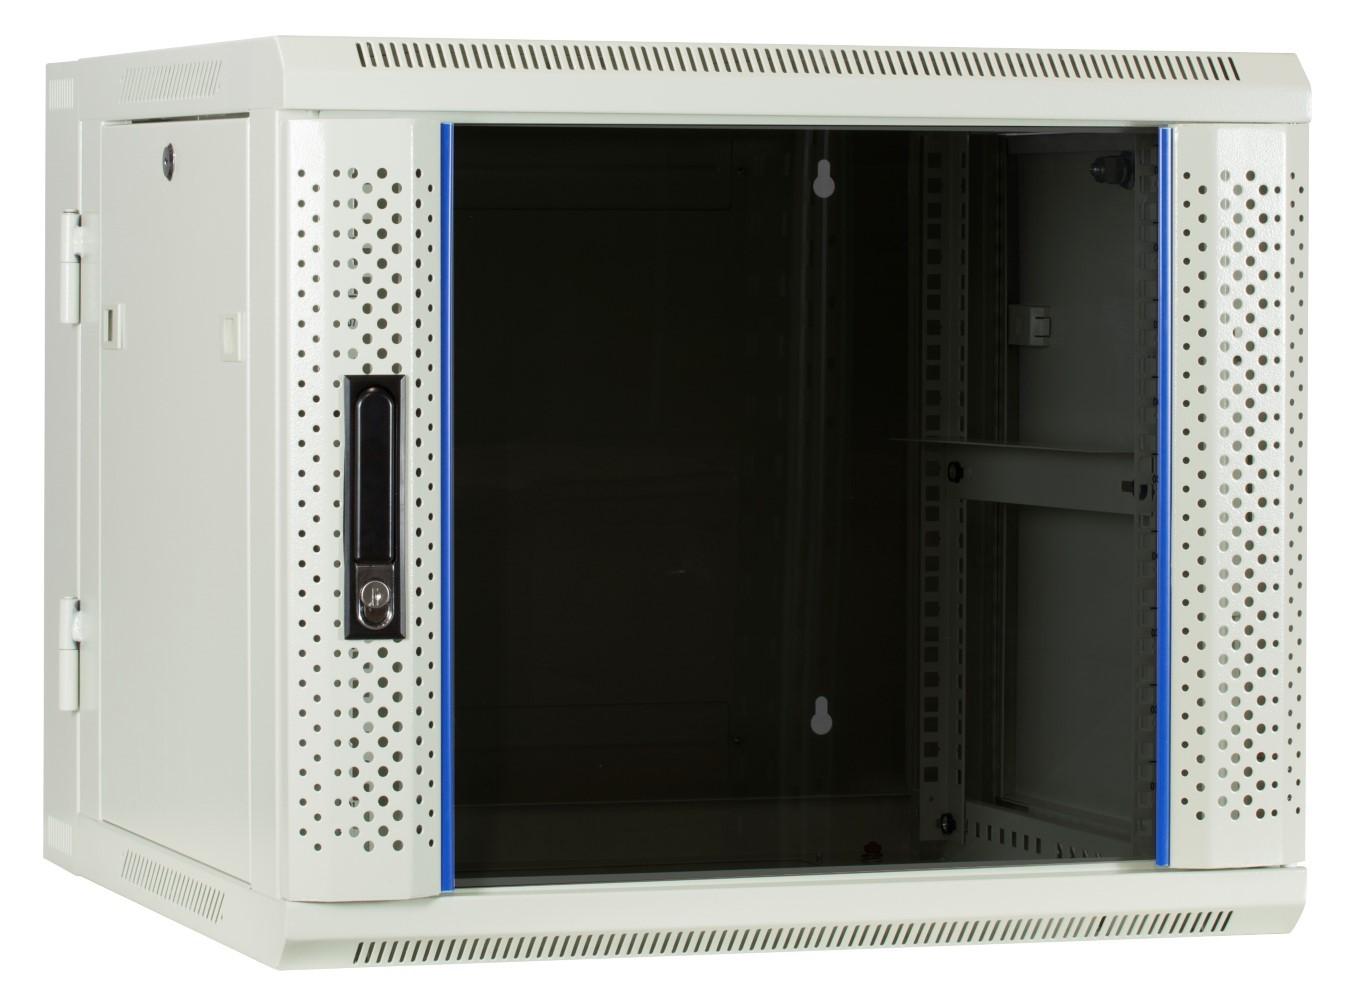 Afbeelding van 9U witte wandkast (kantelbaar) met glazen deur 600x600x500mm